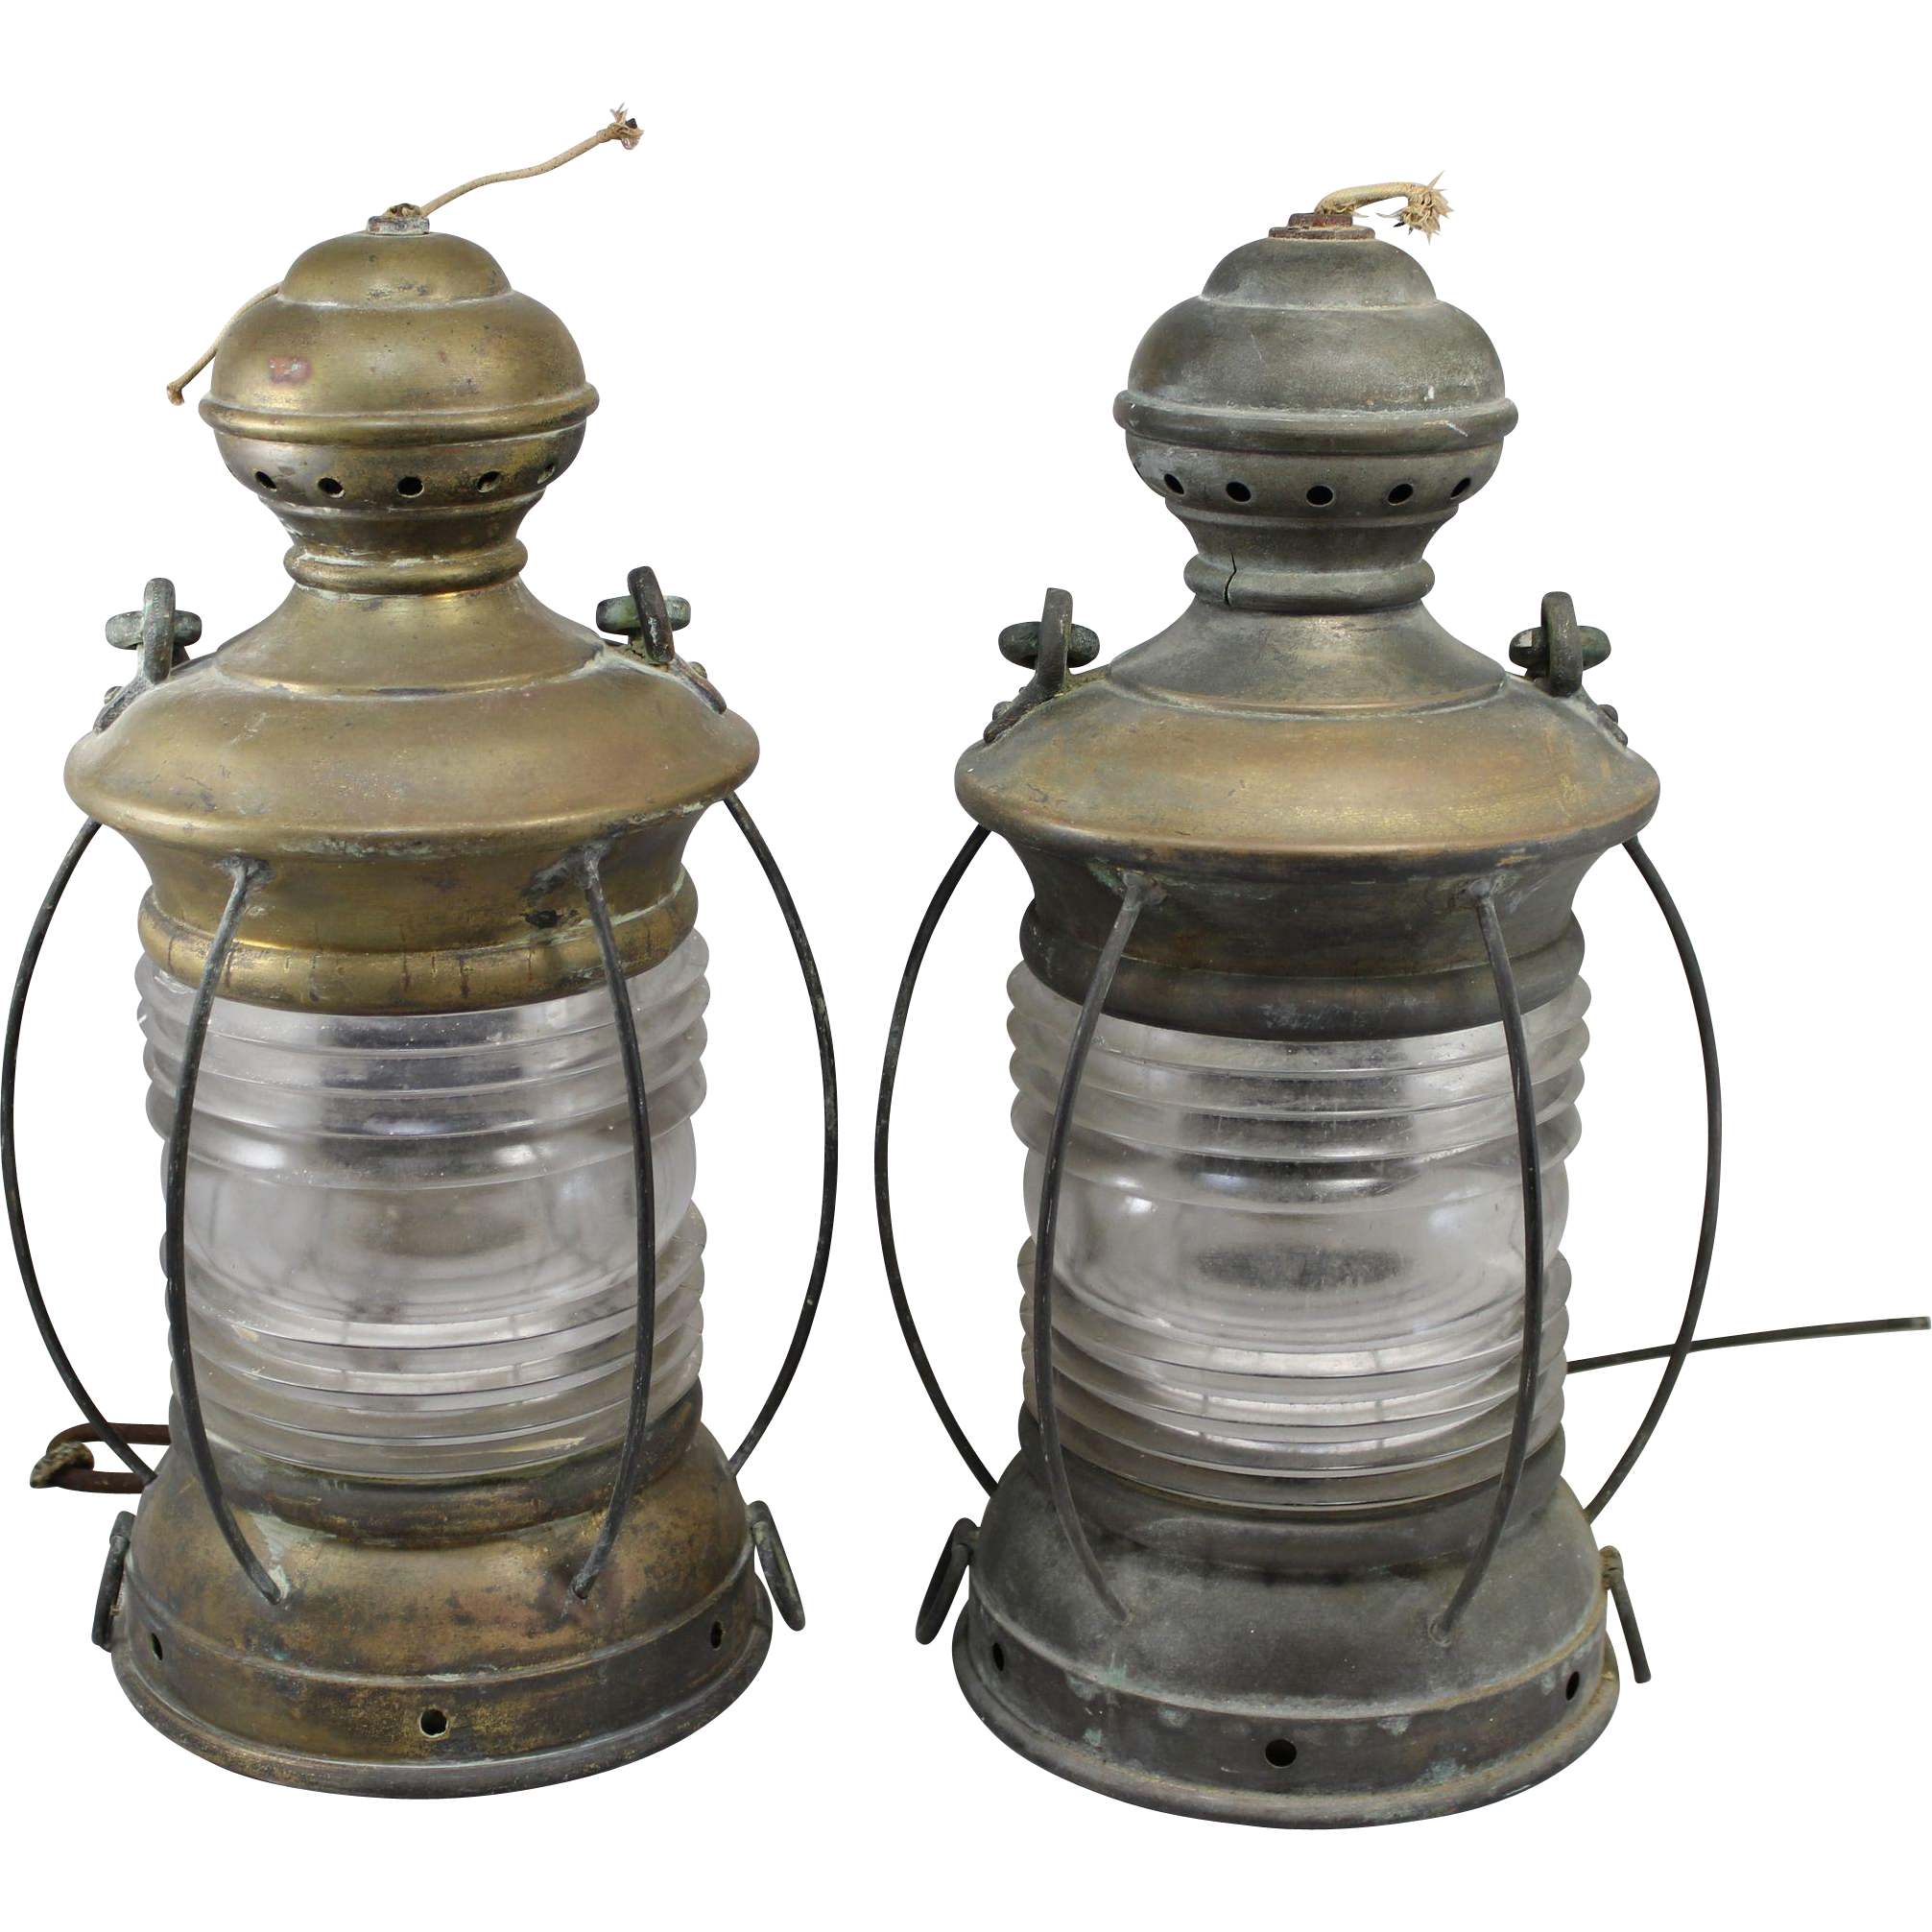 Pair of Perkins Marine Lamp Corp Brass Ship's Lanterns